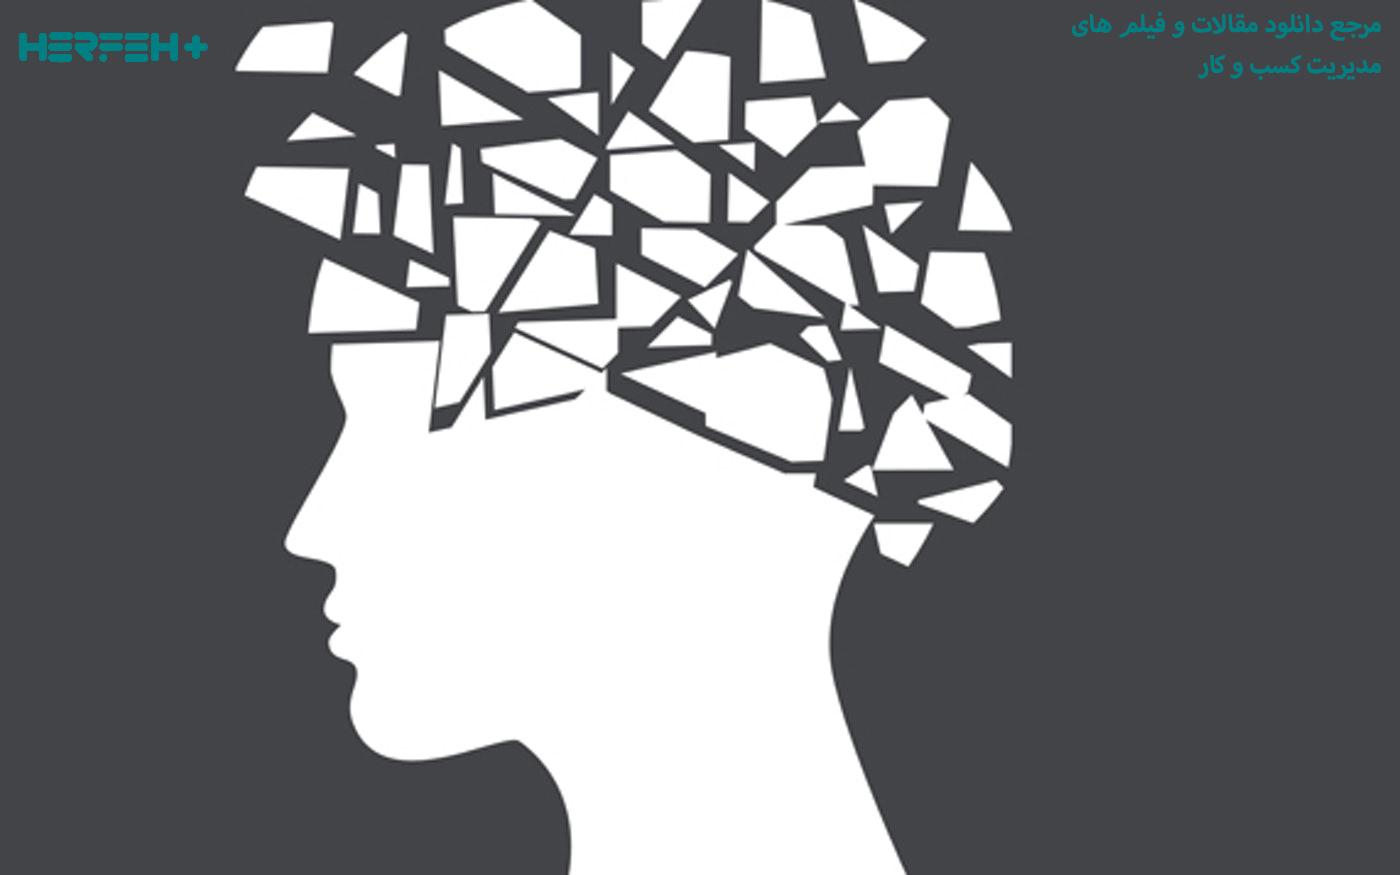 تصویر مفهموی تروما سازمانی، مفاهیم، علل و پیامدها